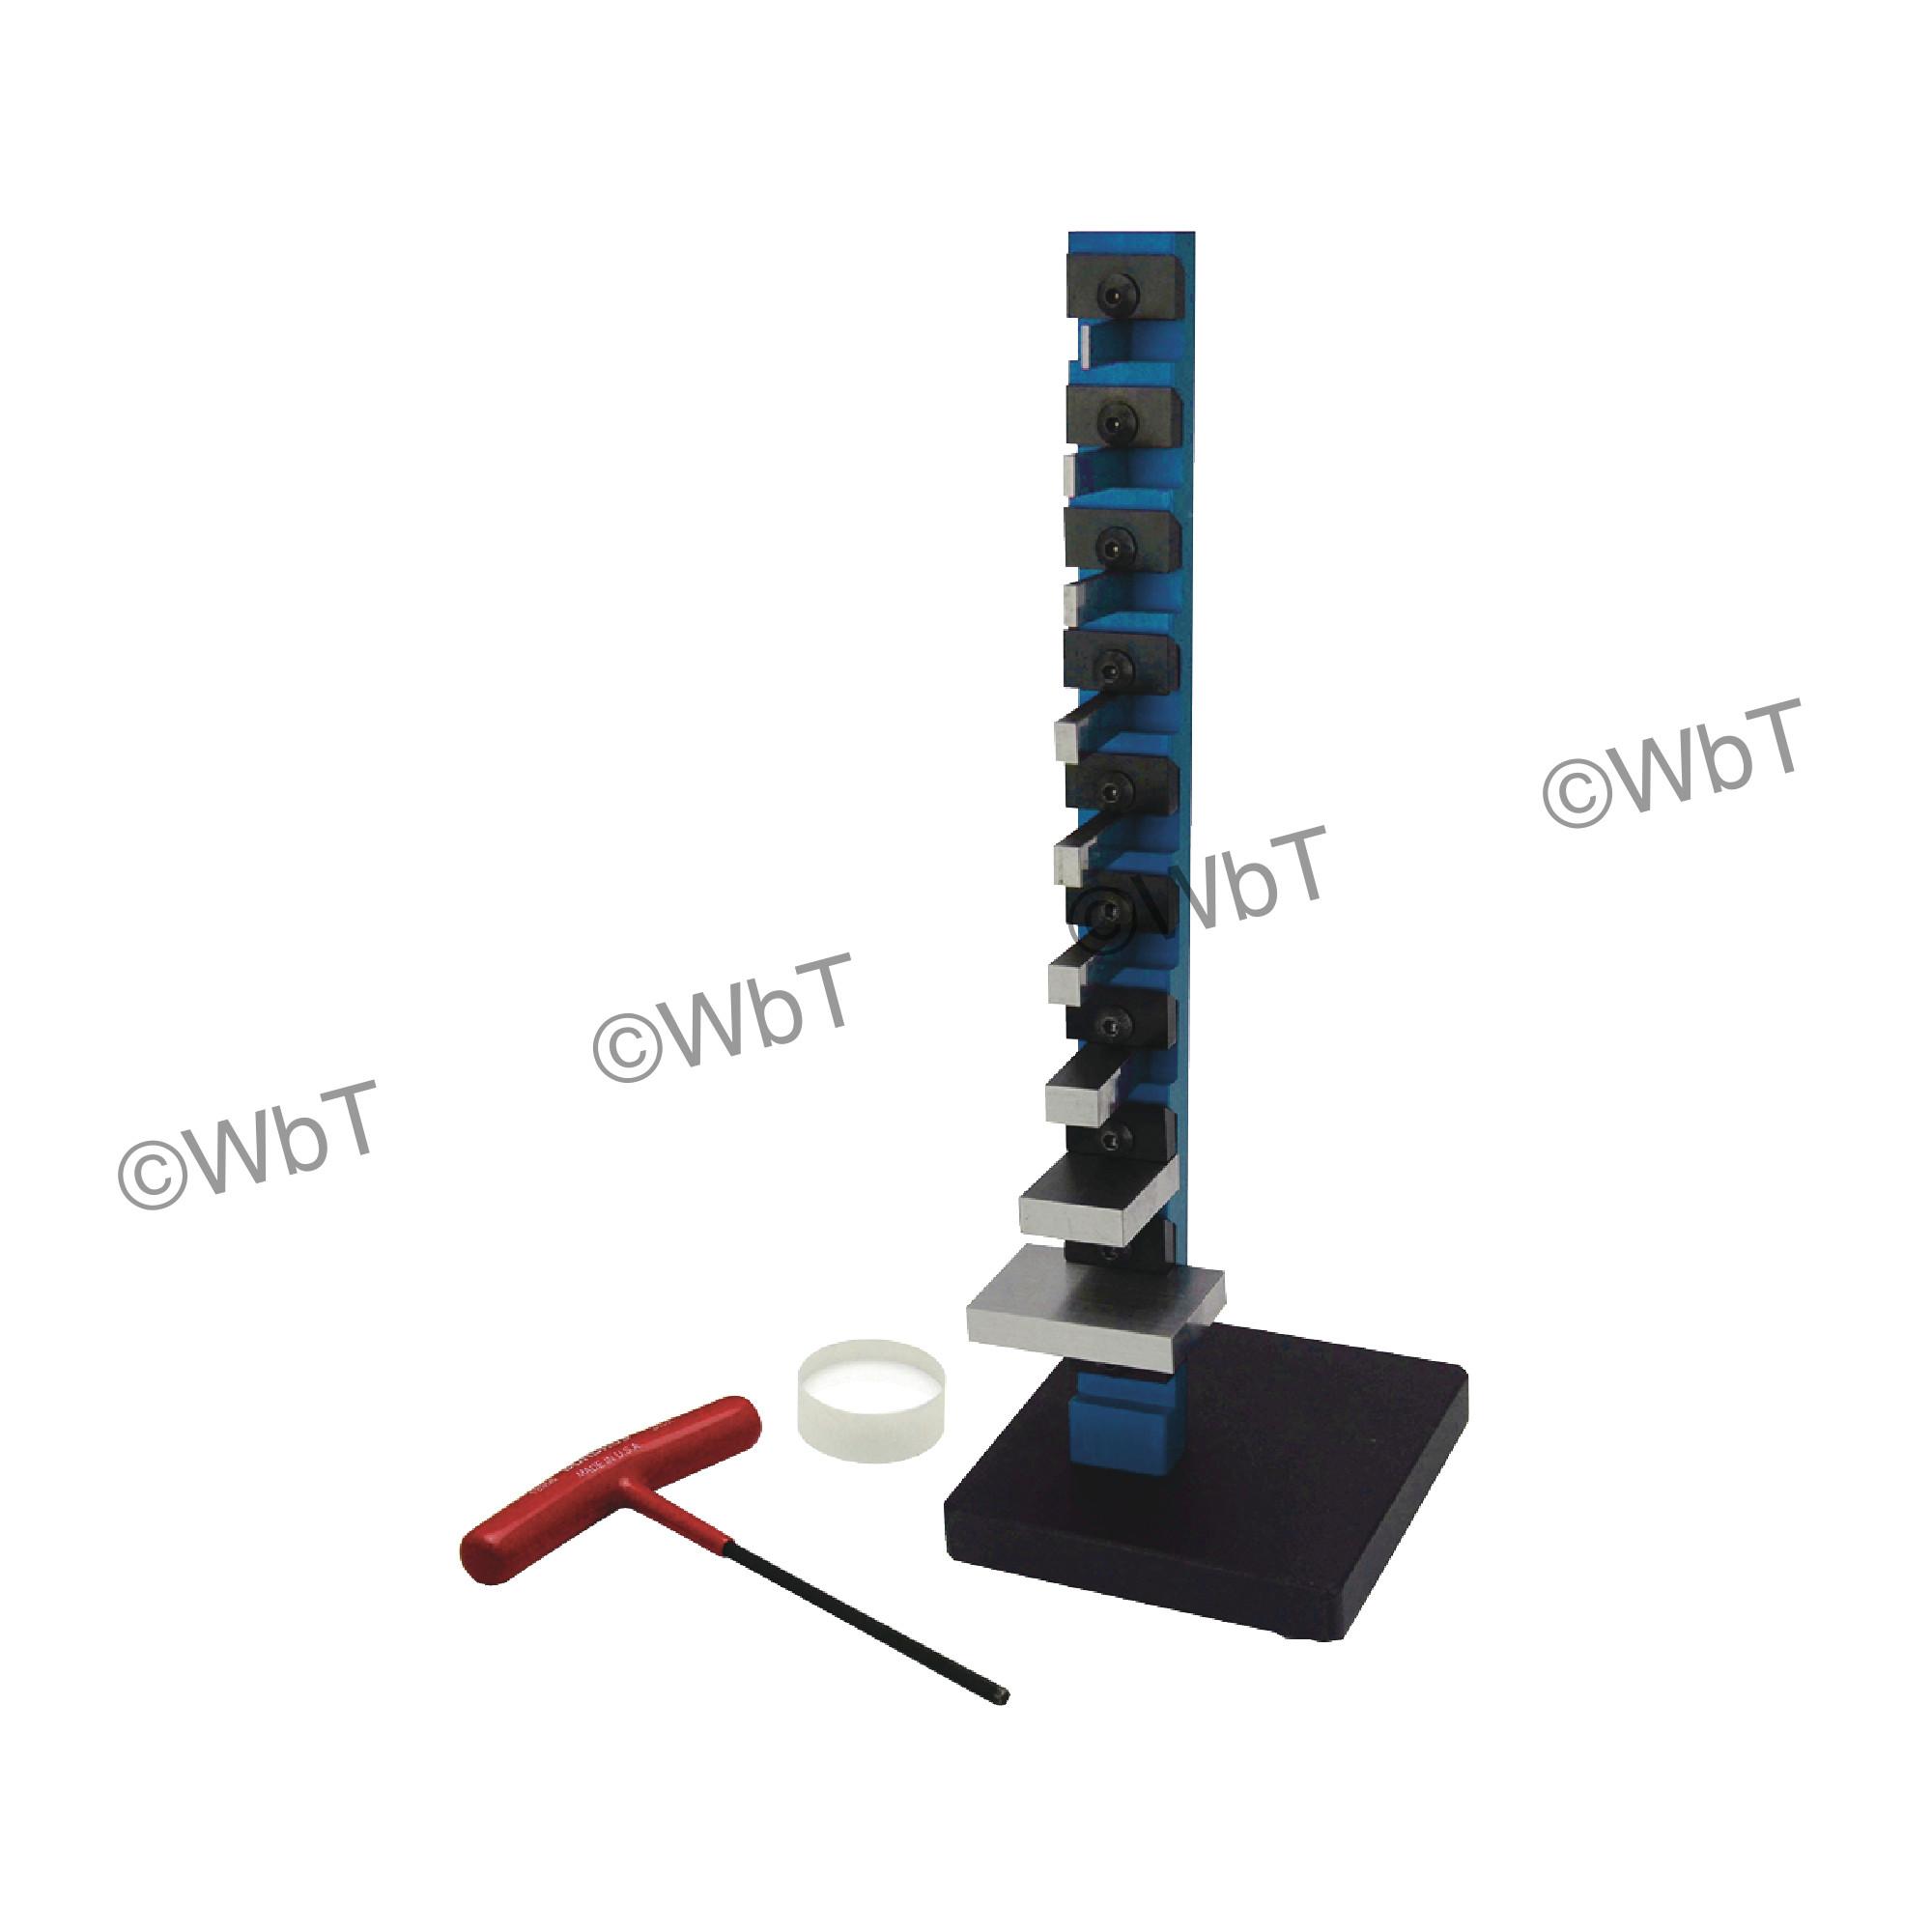 Caliper and Micrometer Calibration Set